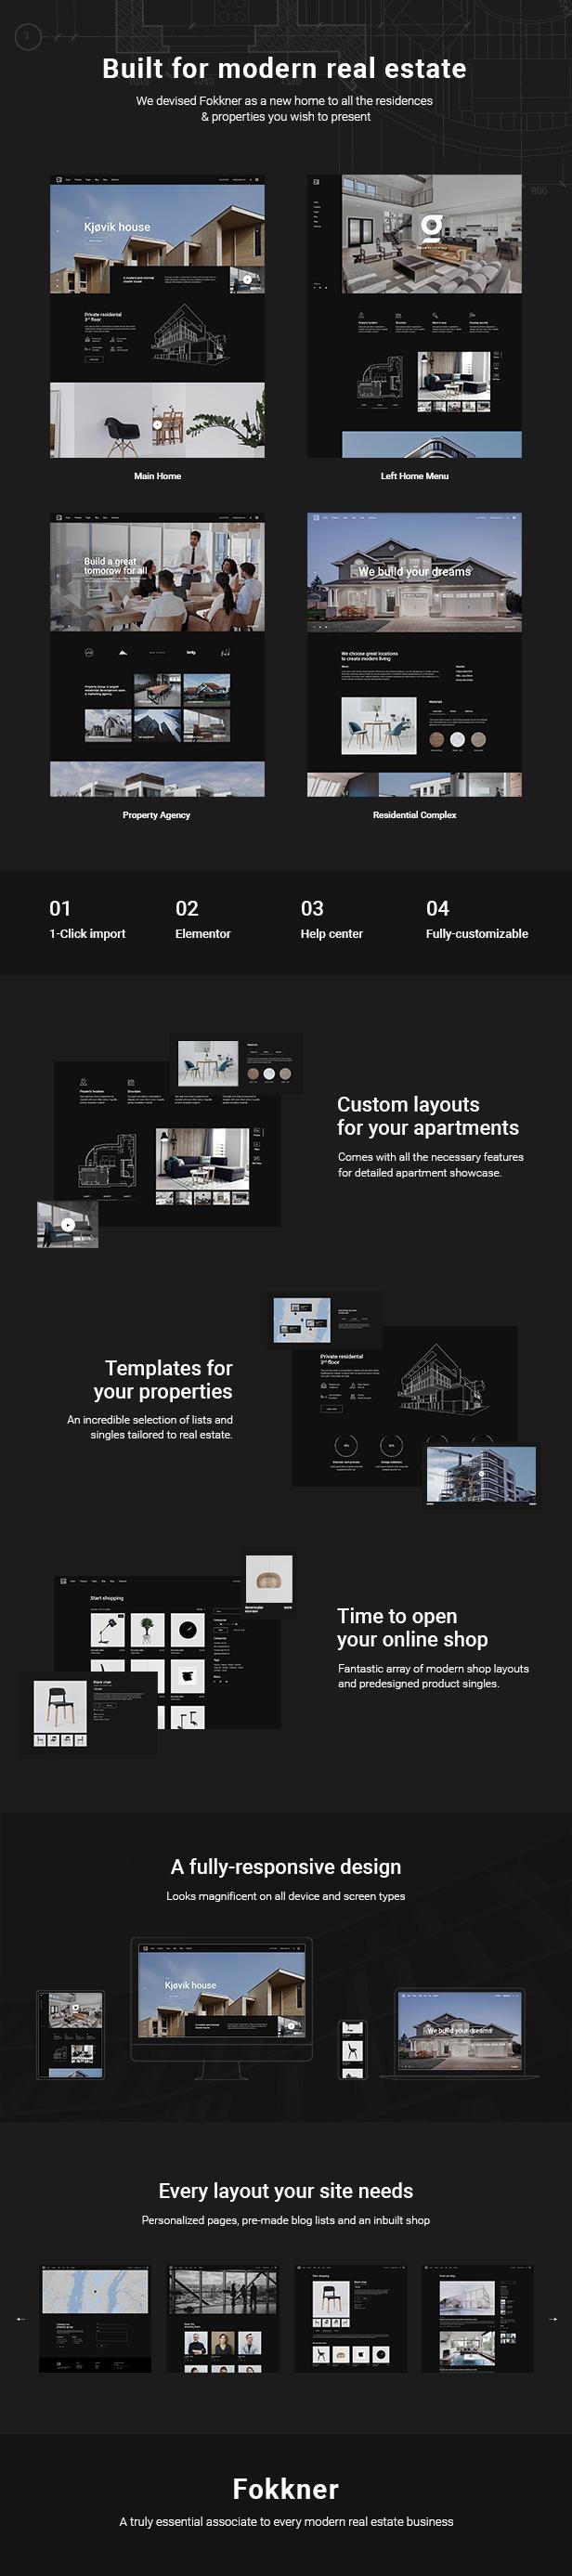 Fokkner Real Estate and Property Free WordPress Theme